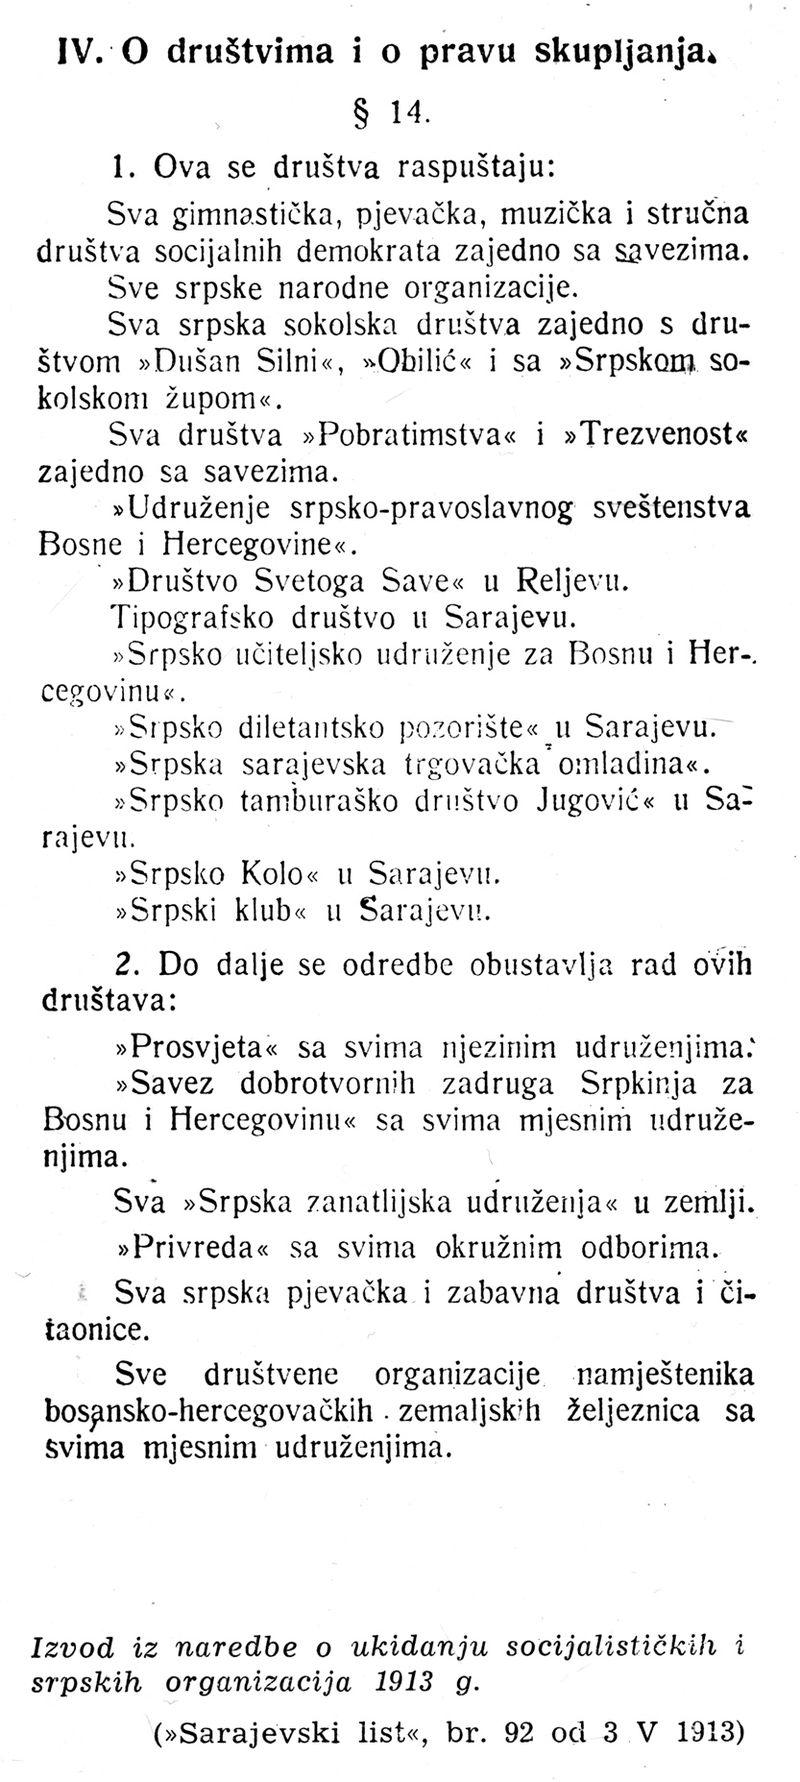 1913 Austro-Hungarian order banning Serb cultural societies in Bosnia.jpg